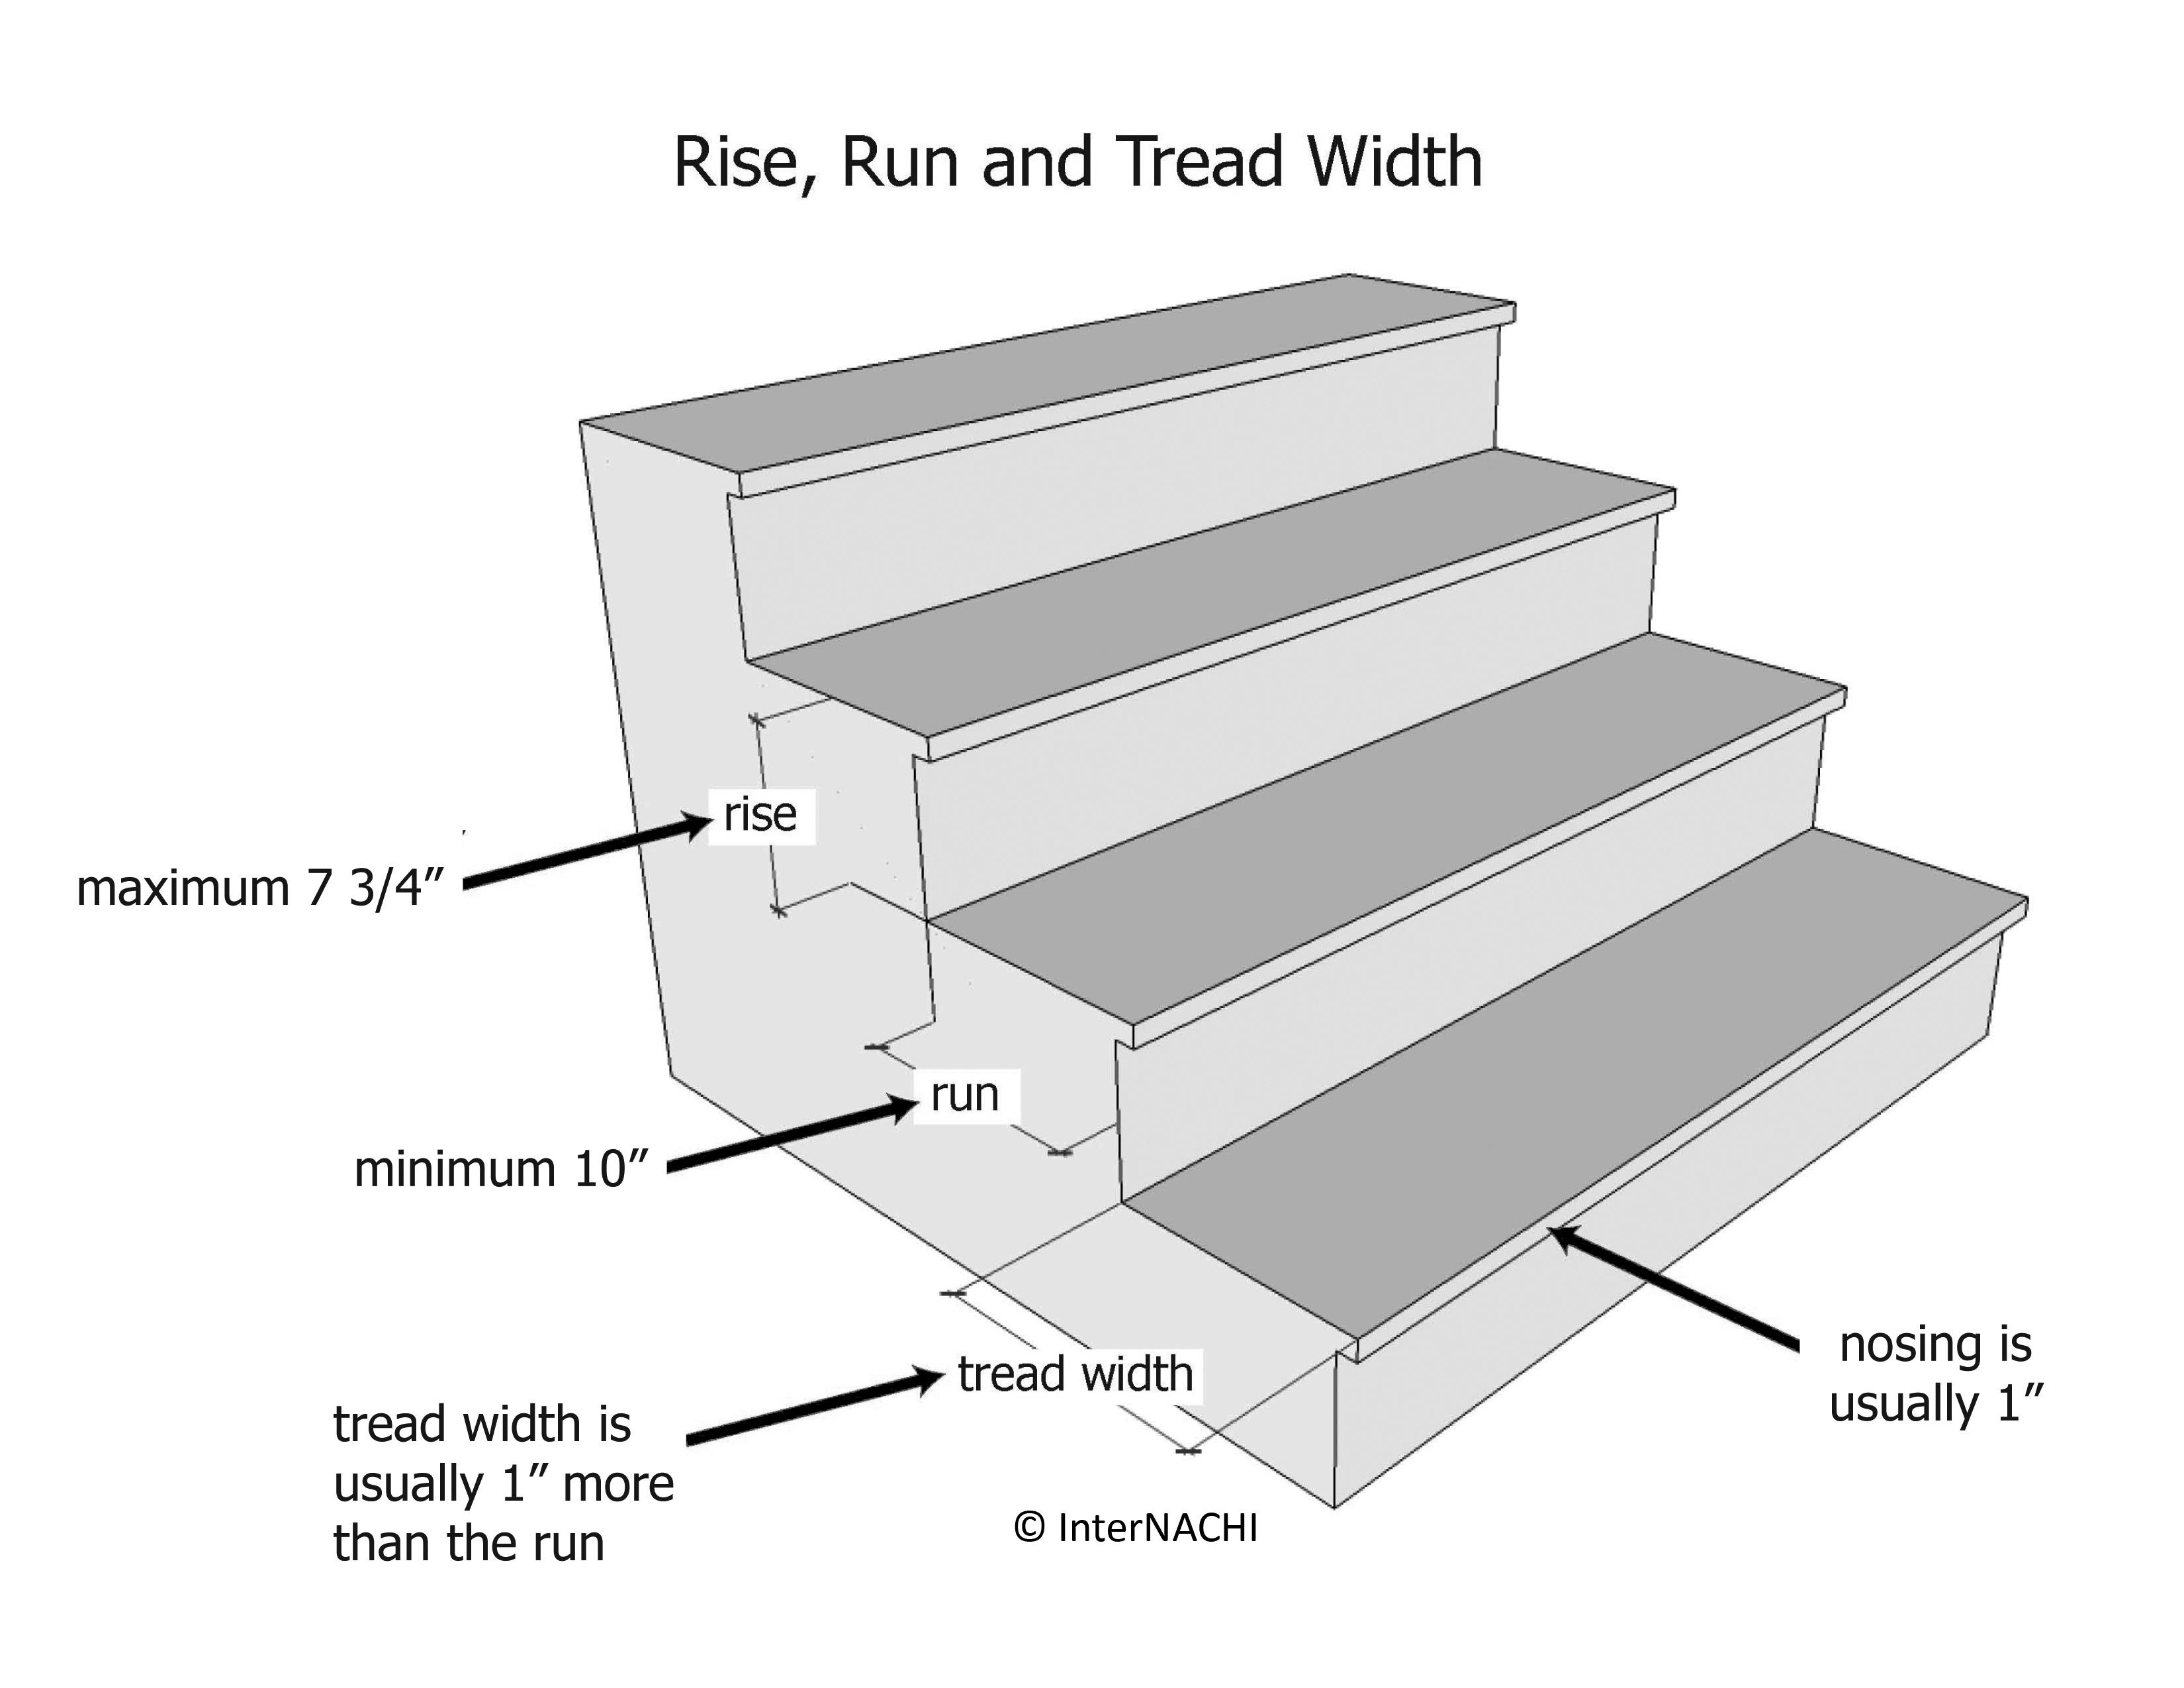 Rise, run and tread width.